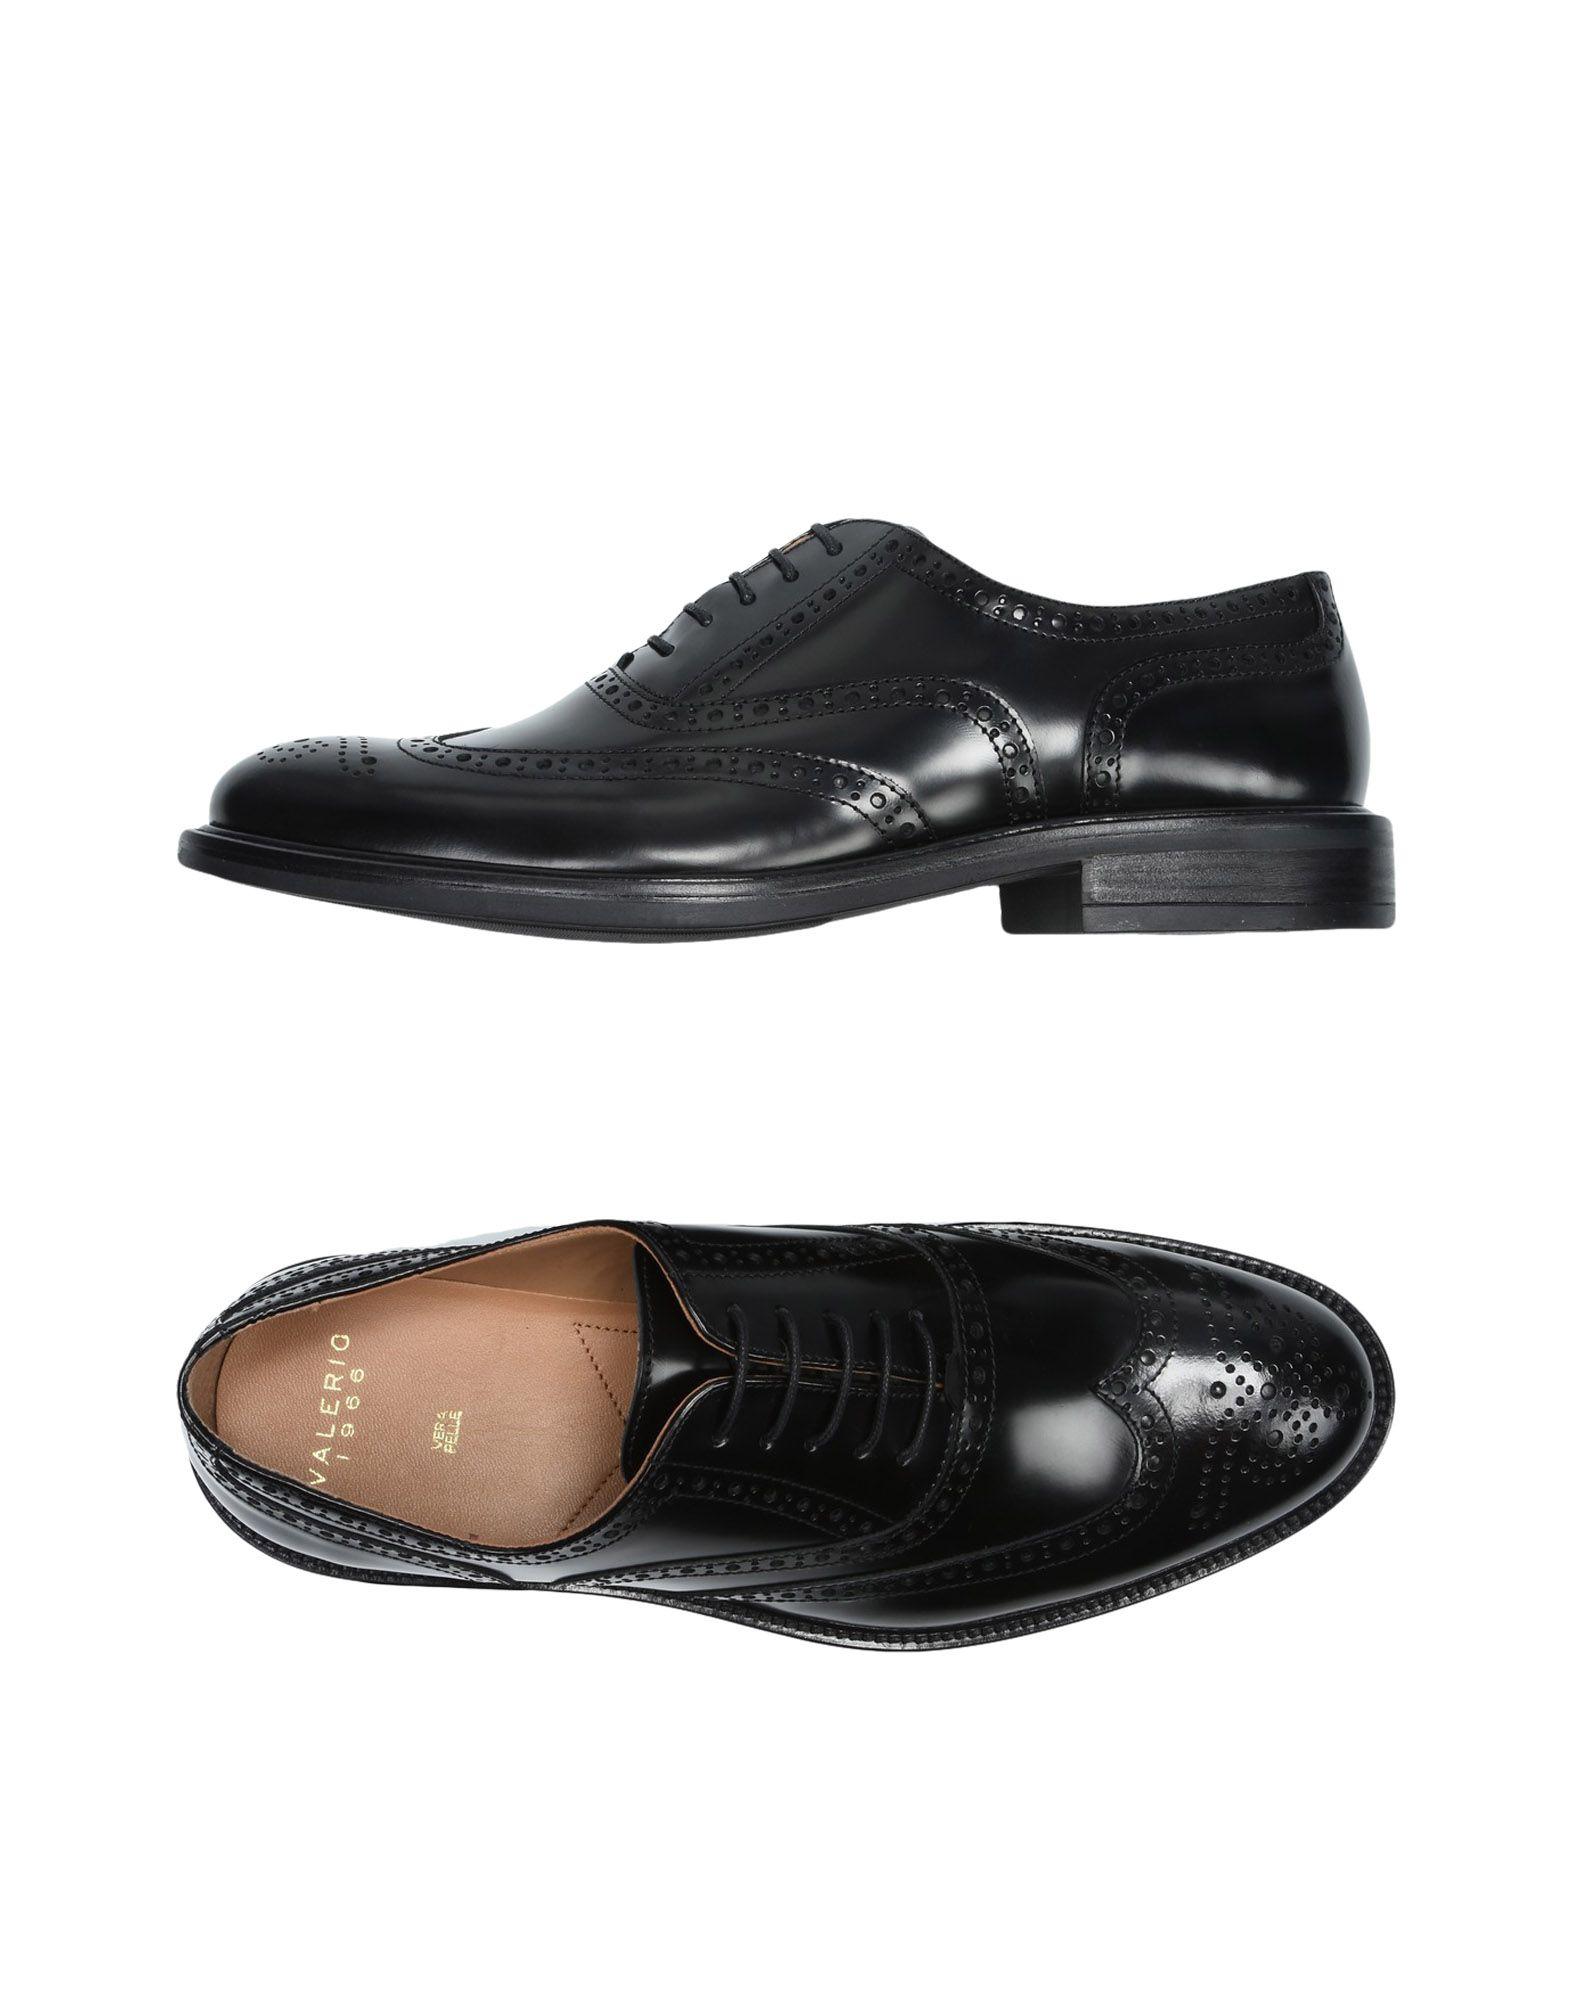 Rabatt echte Herren Schuhe Valerio 1966 Schnürschuhe Herren echte  11470804QN 67d753